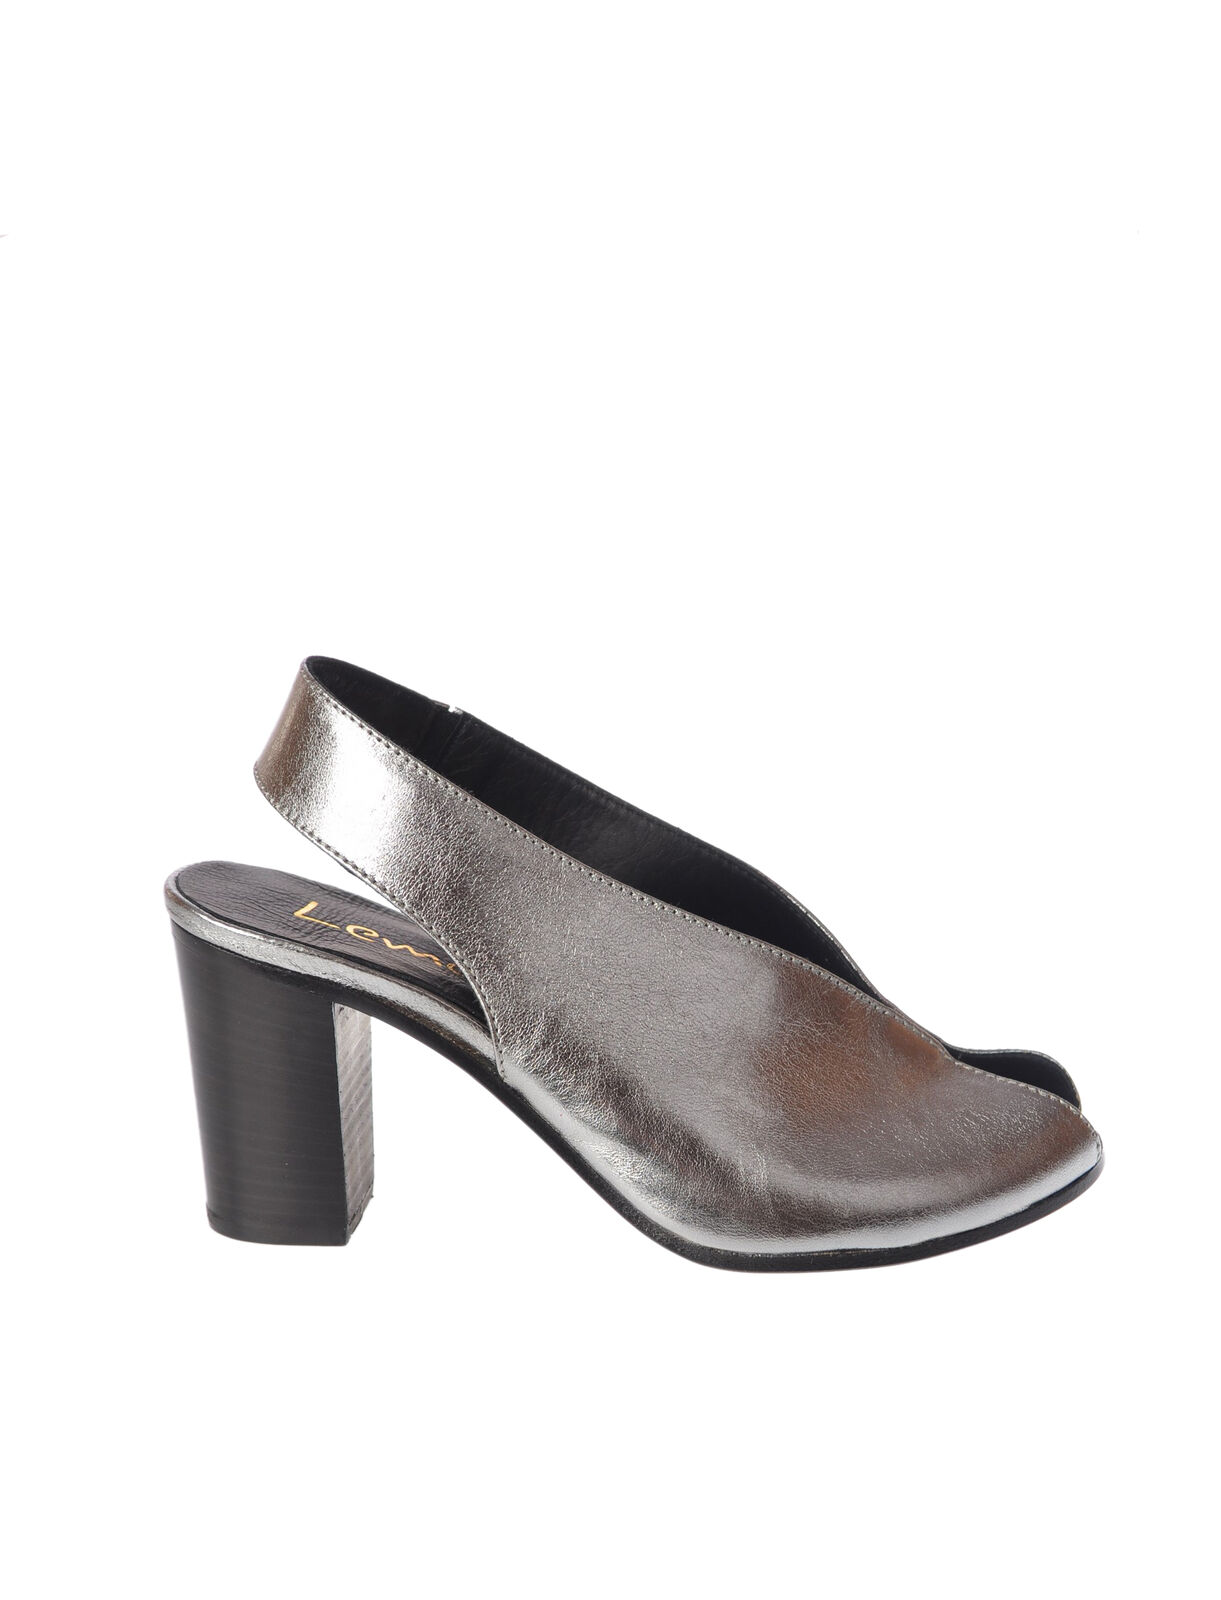 Lemarè - zapatos-Sandals - Woman - plata - 4753206G184112